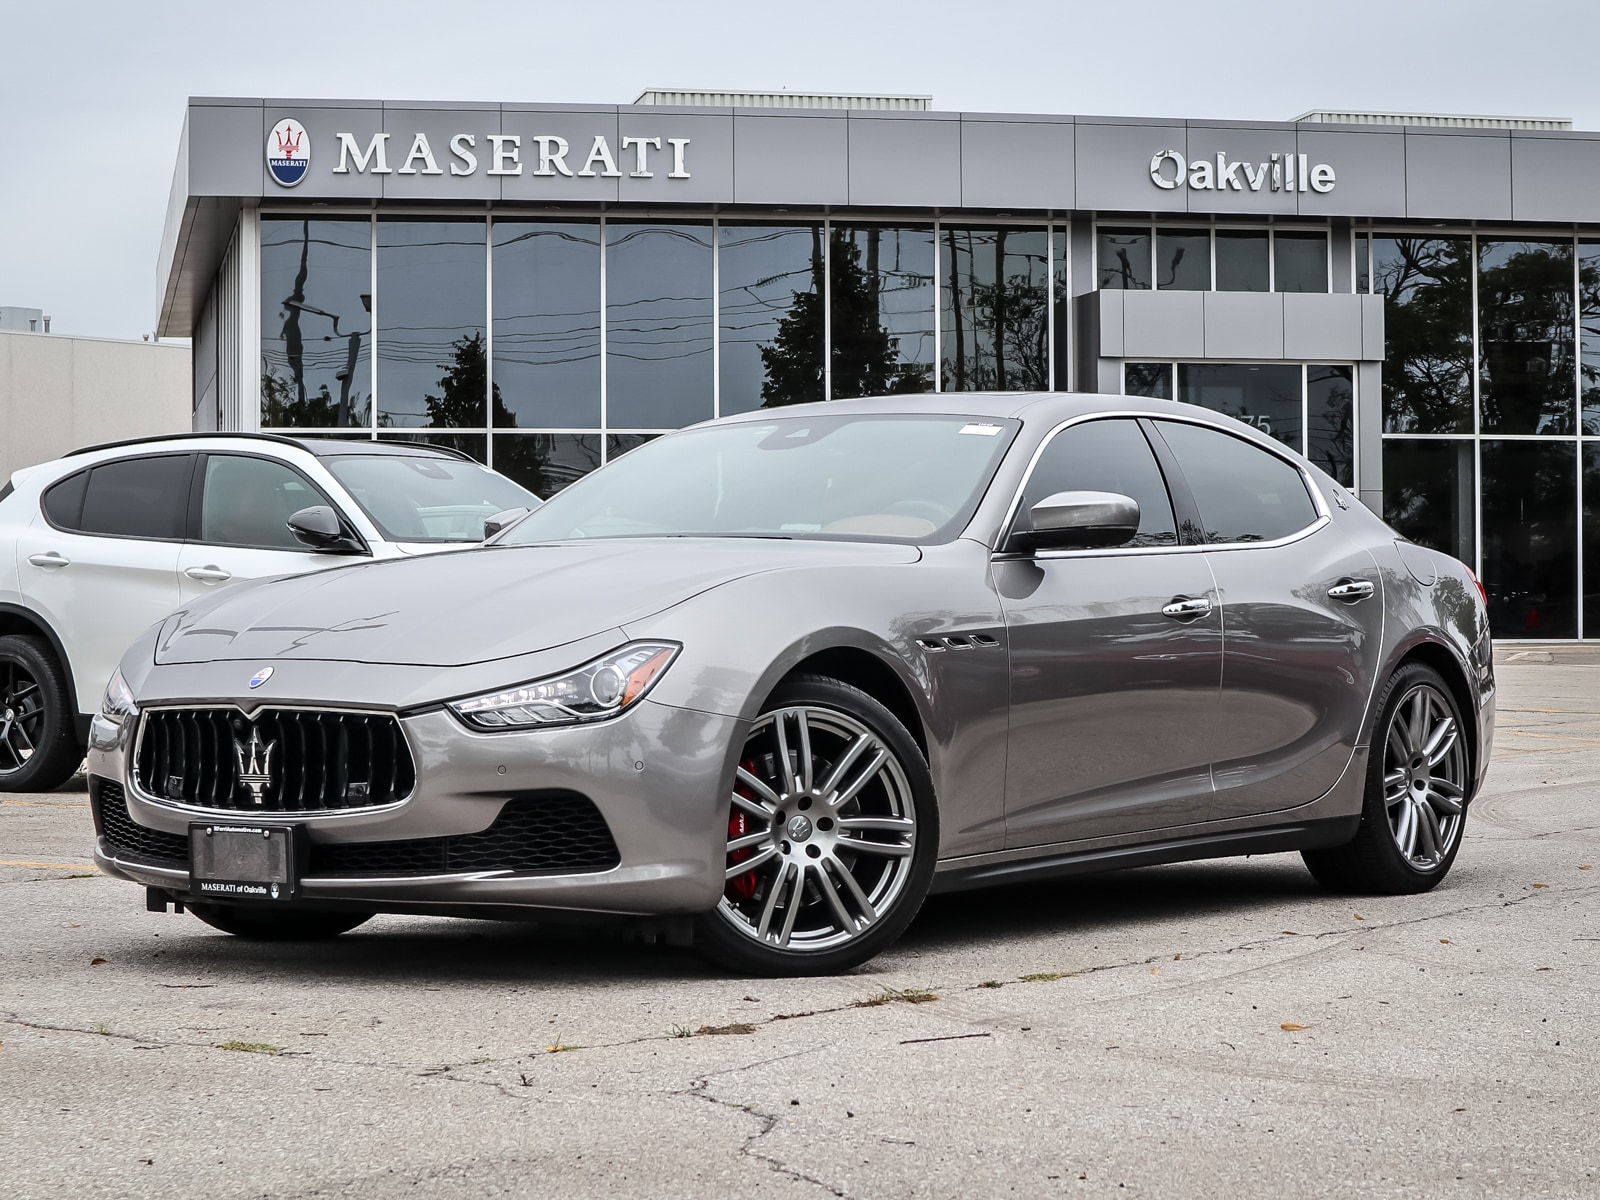 2017 Maserati Ghibli S Q4 *Maserati Certified 1.9%*